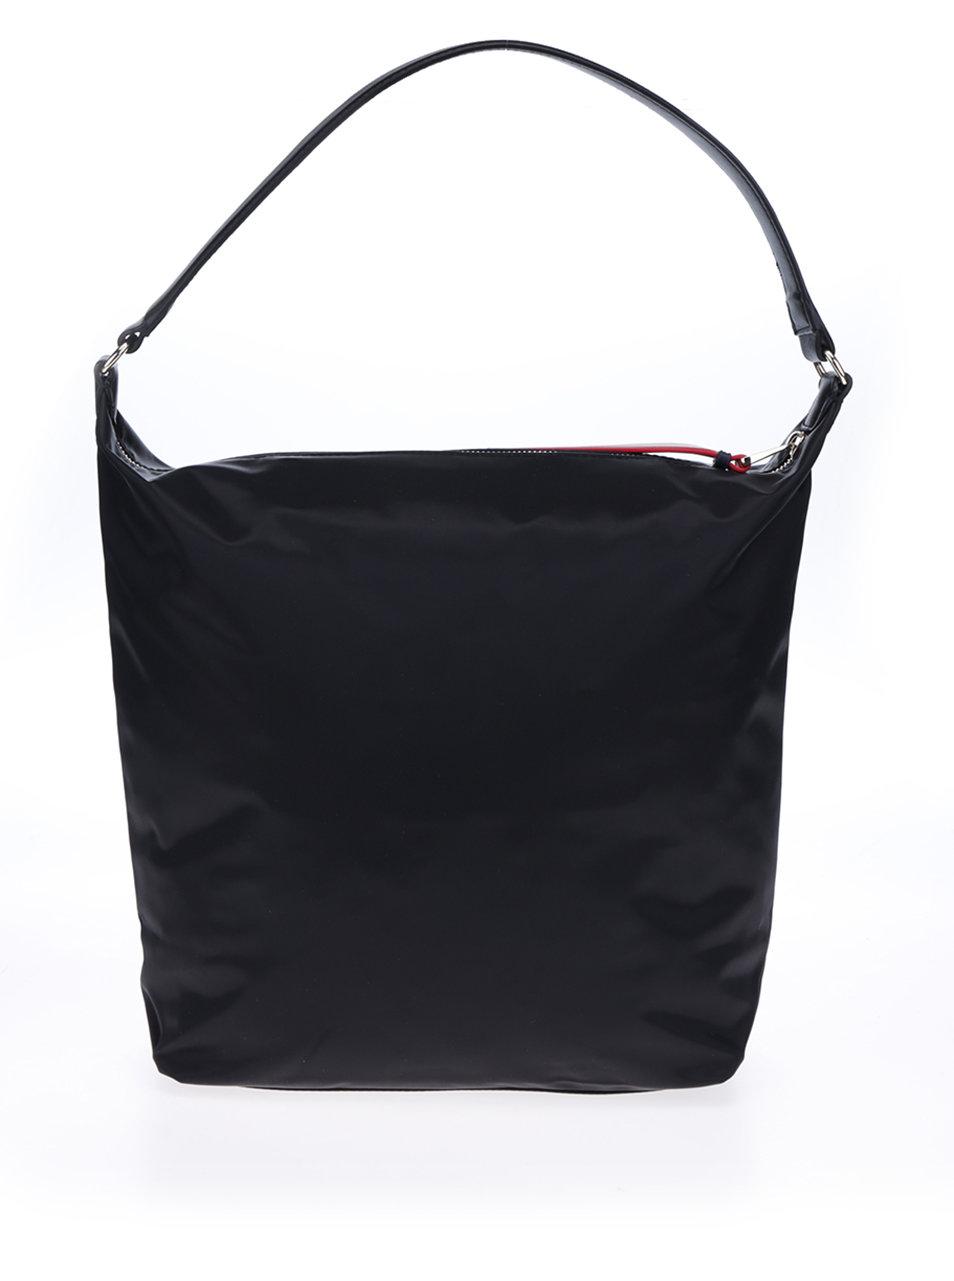 Čierna kabelka do ruky Tommy Hilfiger Poppy Hobo ... cf927260e45